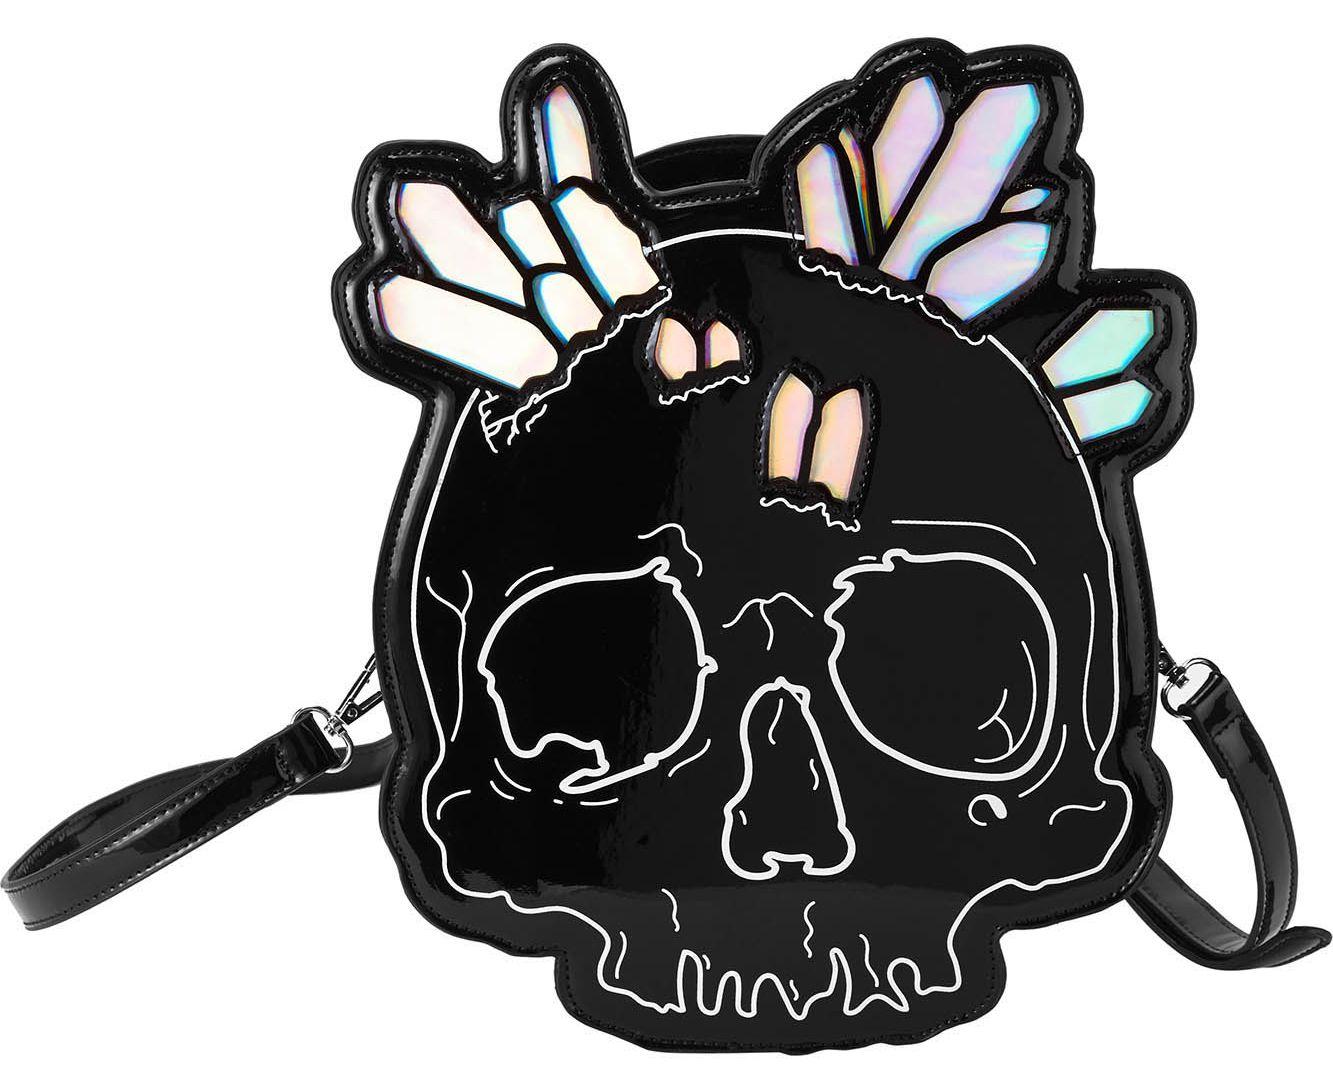 ks0424_sac-a-main-gothique-glam-rock-druzy-skull